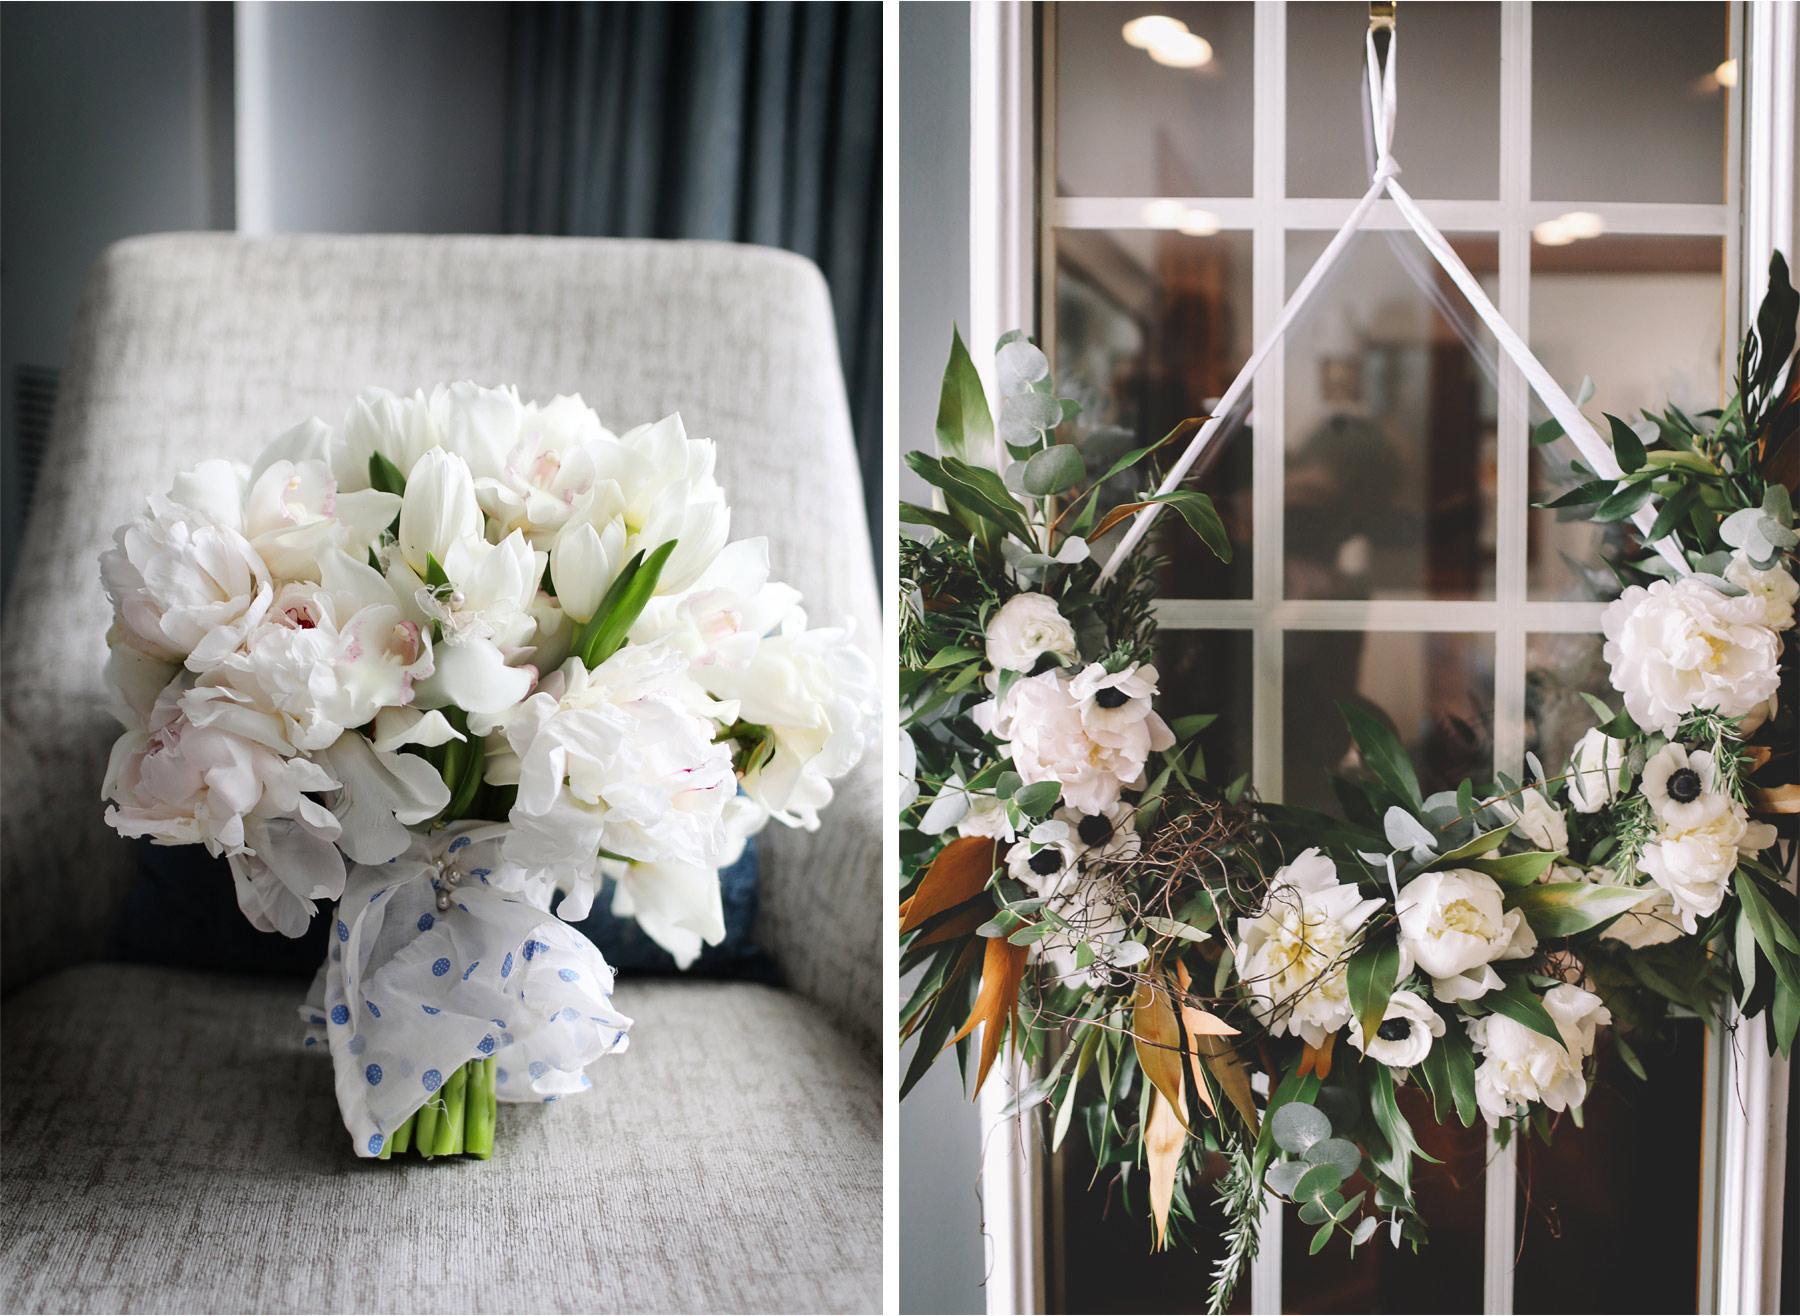 03-Minneapolis-Minnesota-Wedding-Photography-by-Vick-Photography-Loews-Hotel-Bouquet-Flower-Wreath-Joan-and-Tim.jpg